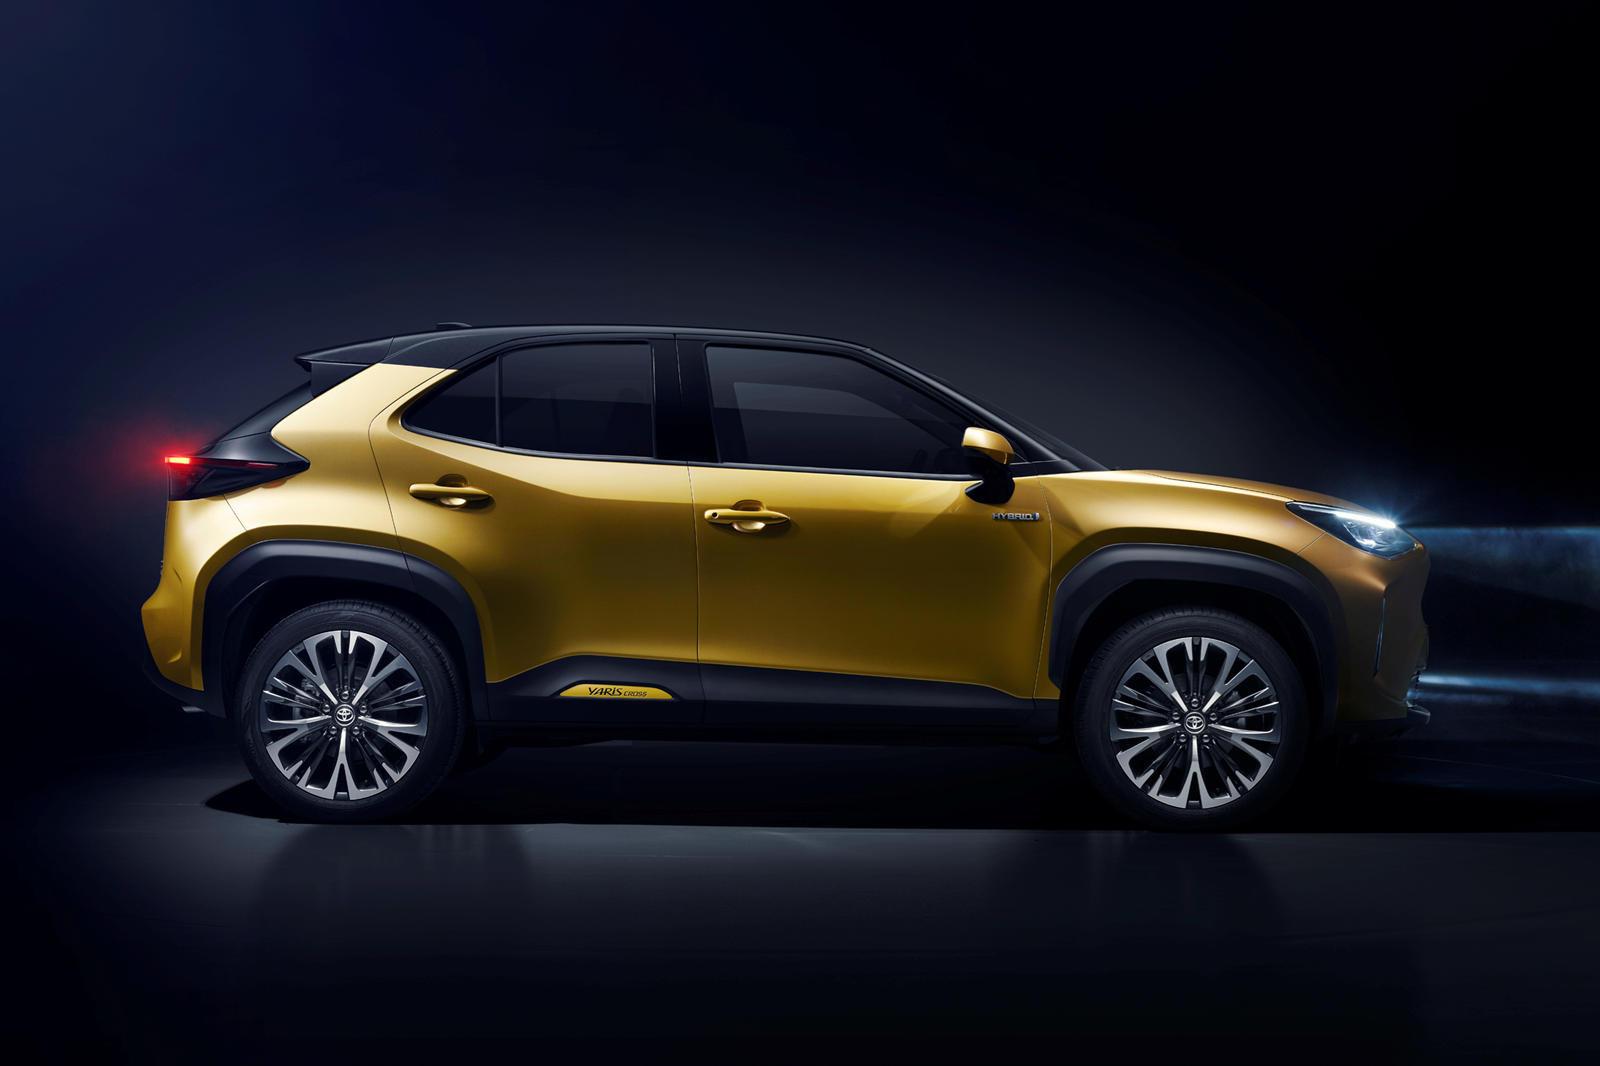 Lexus sẽ sản xuất 1 mẫu xe cỡ nhỏ giống Yaris